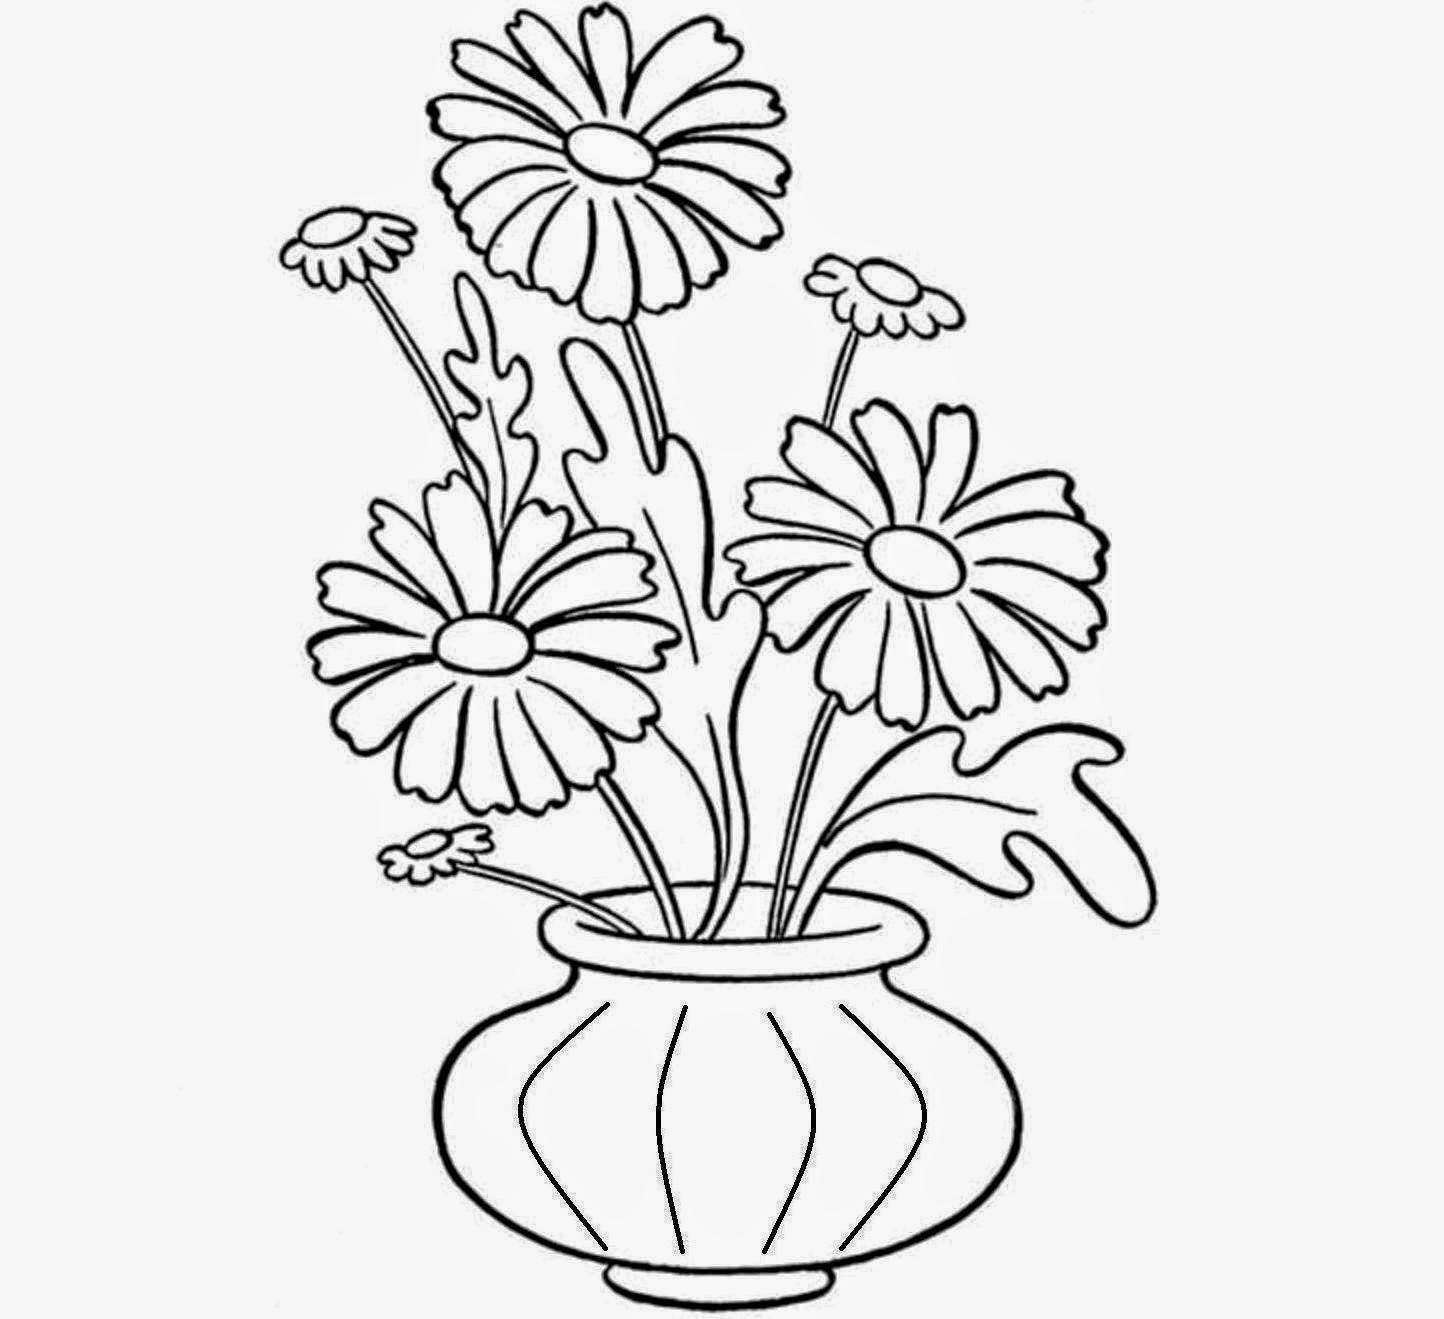 1444x1319 Drawing Of Flower Vase For Kid Draw A Flower Vase For Kids How